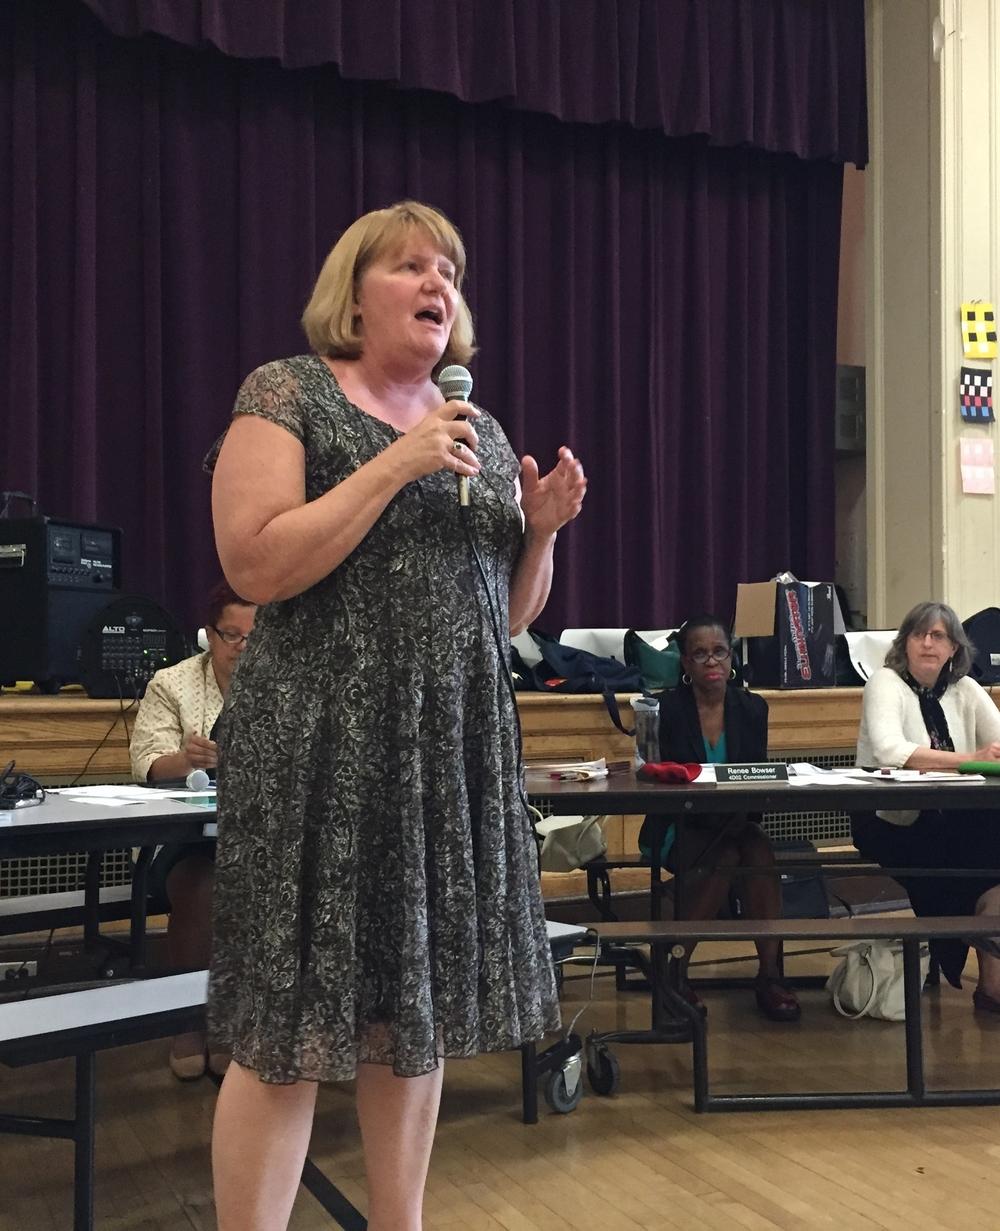 Truesdell Principal Mary Ann Stinson